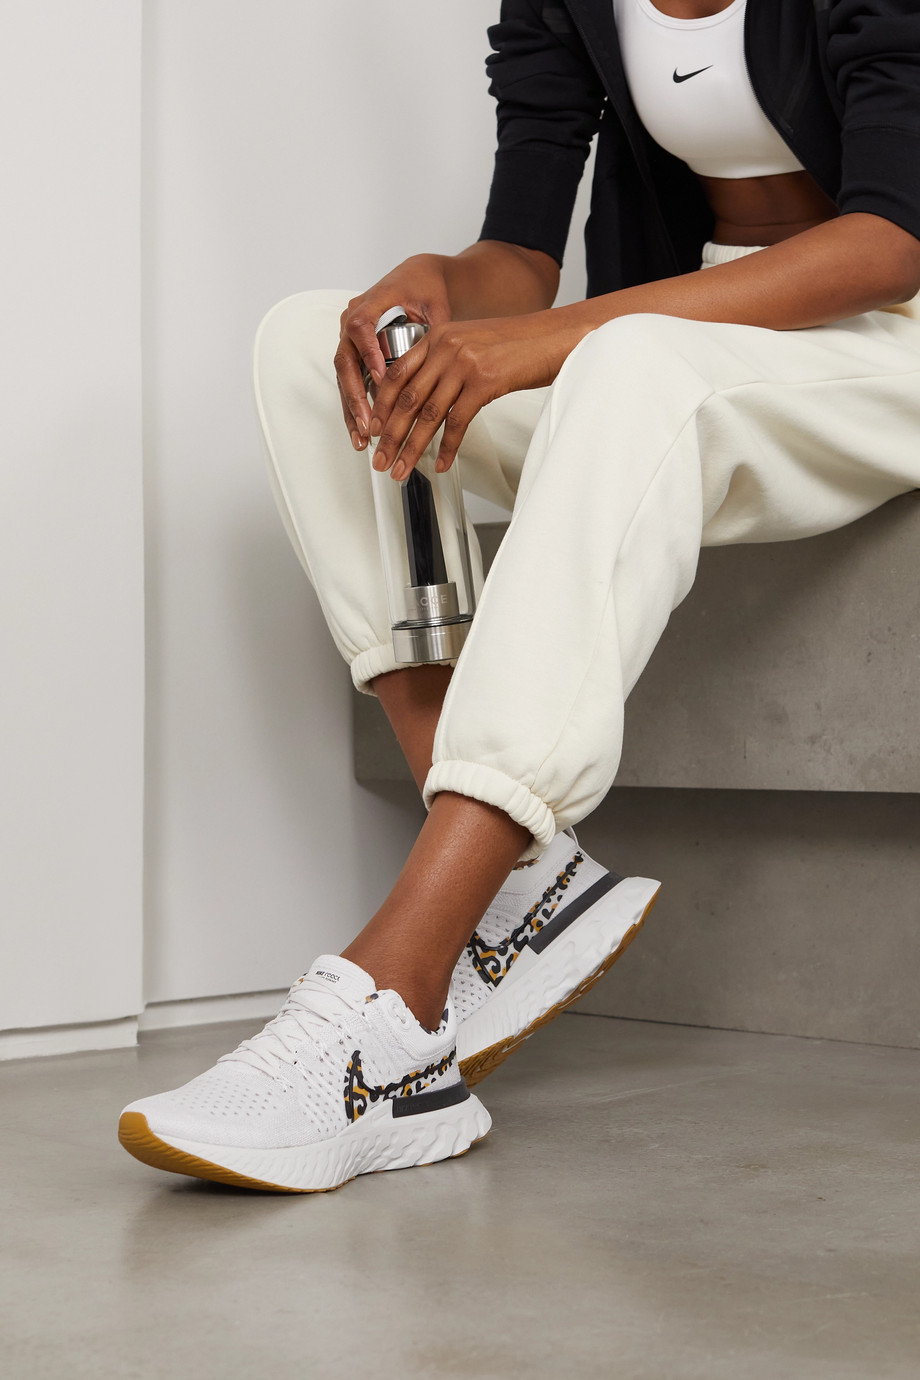 Nike React Infinity Run 2 Flyknit sneakers